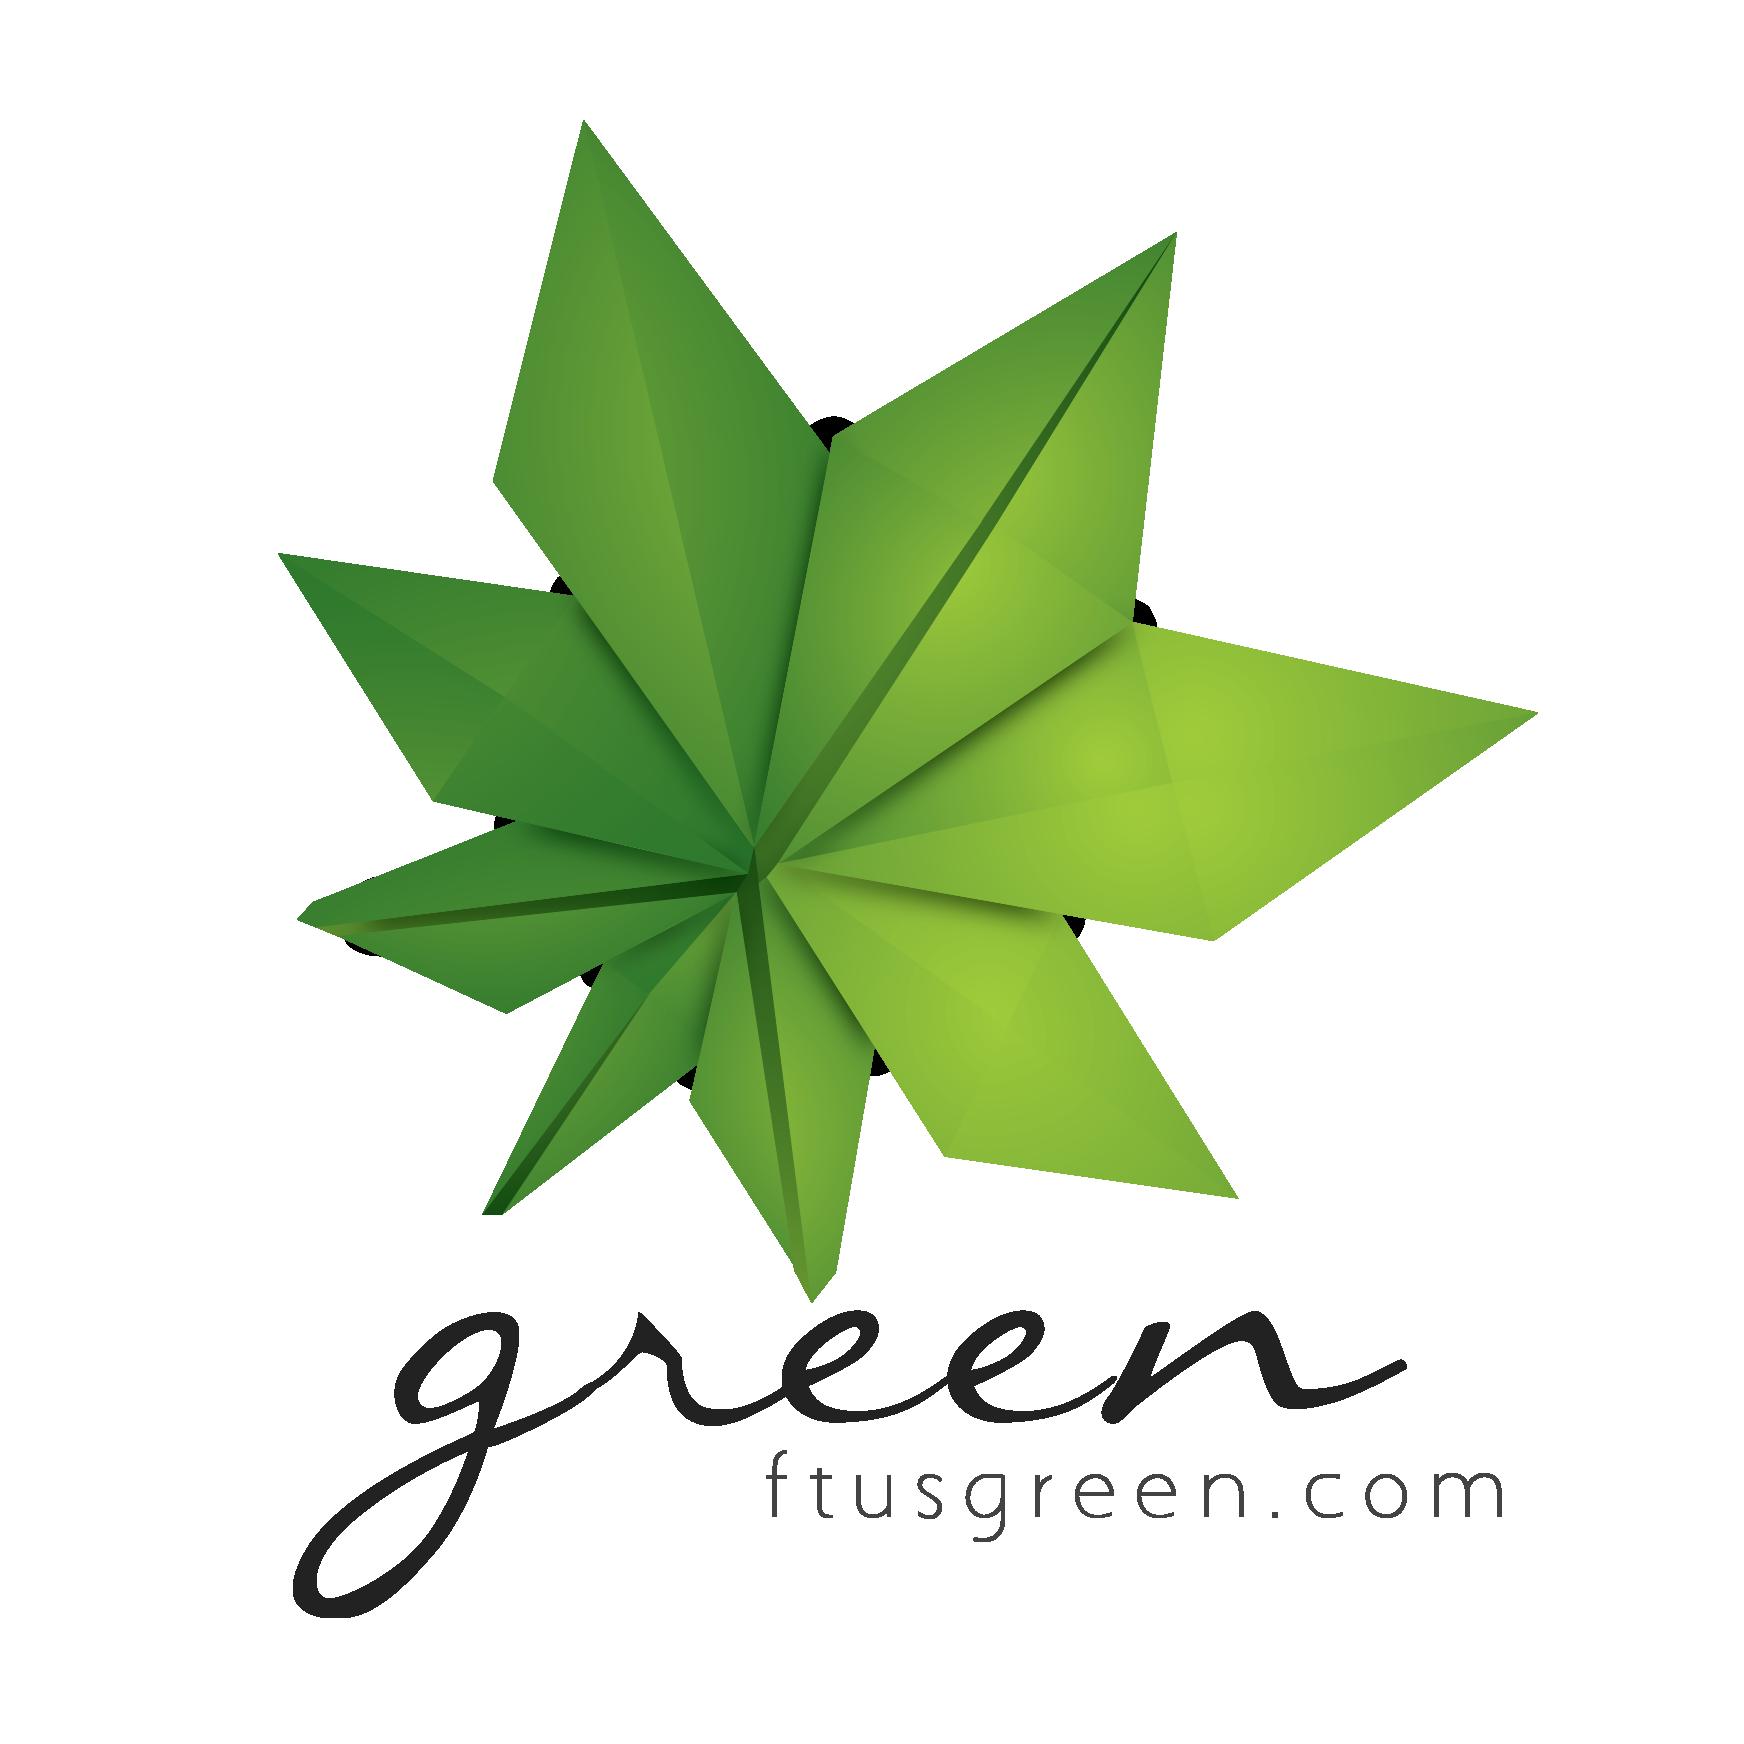 FTU's Green - Logo